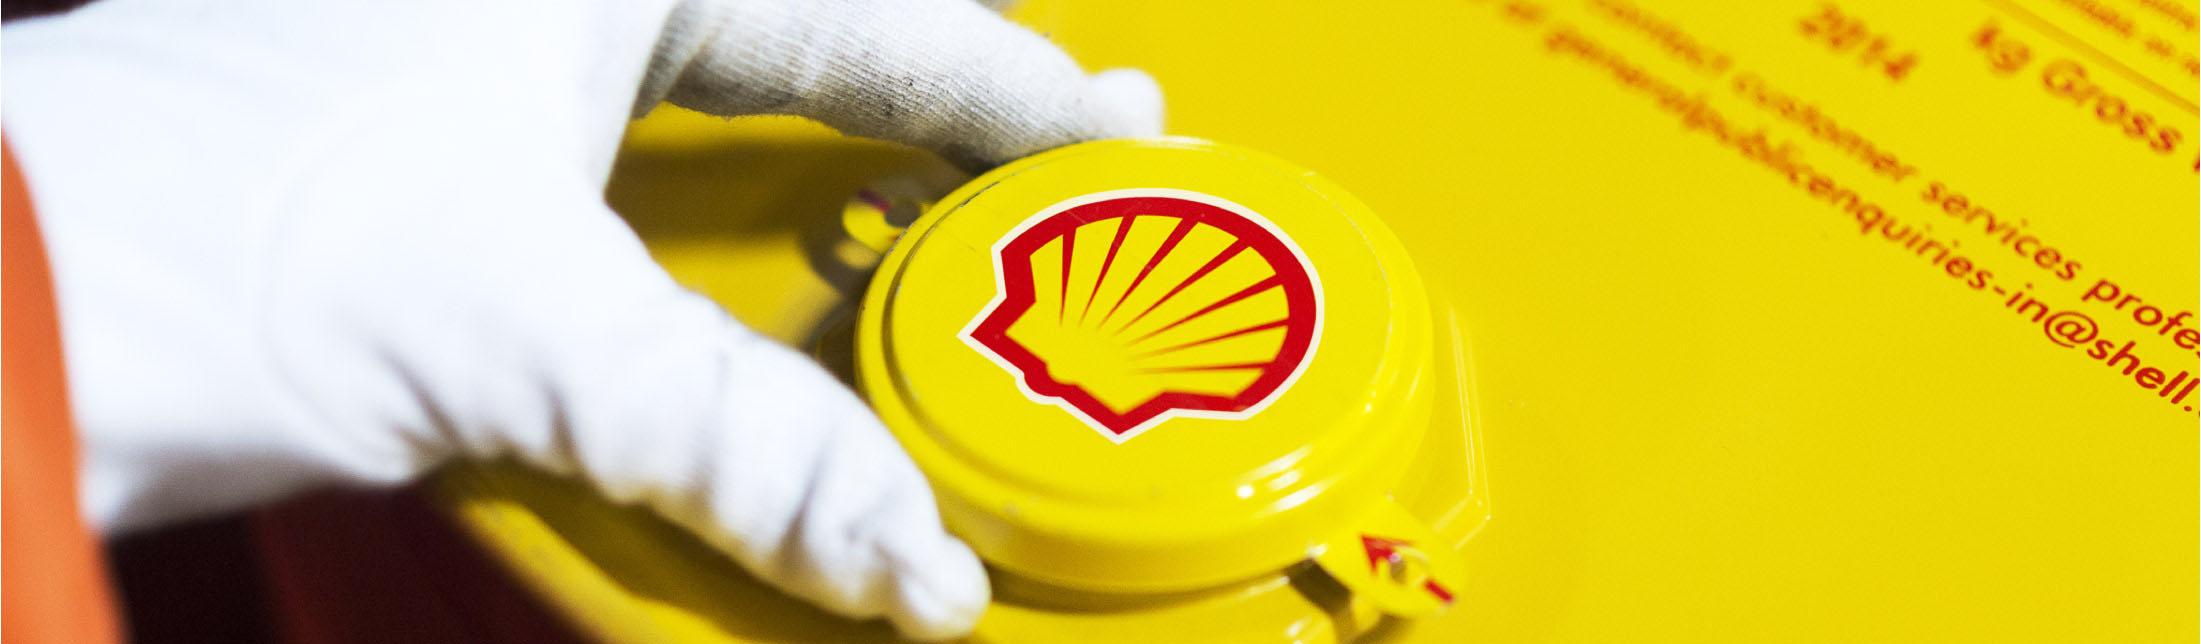 Shell, leader mondial des lubrifiants